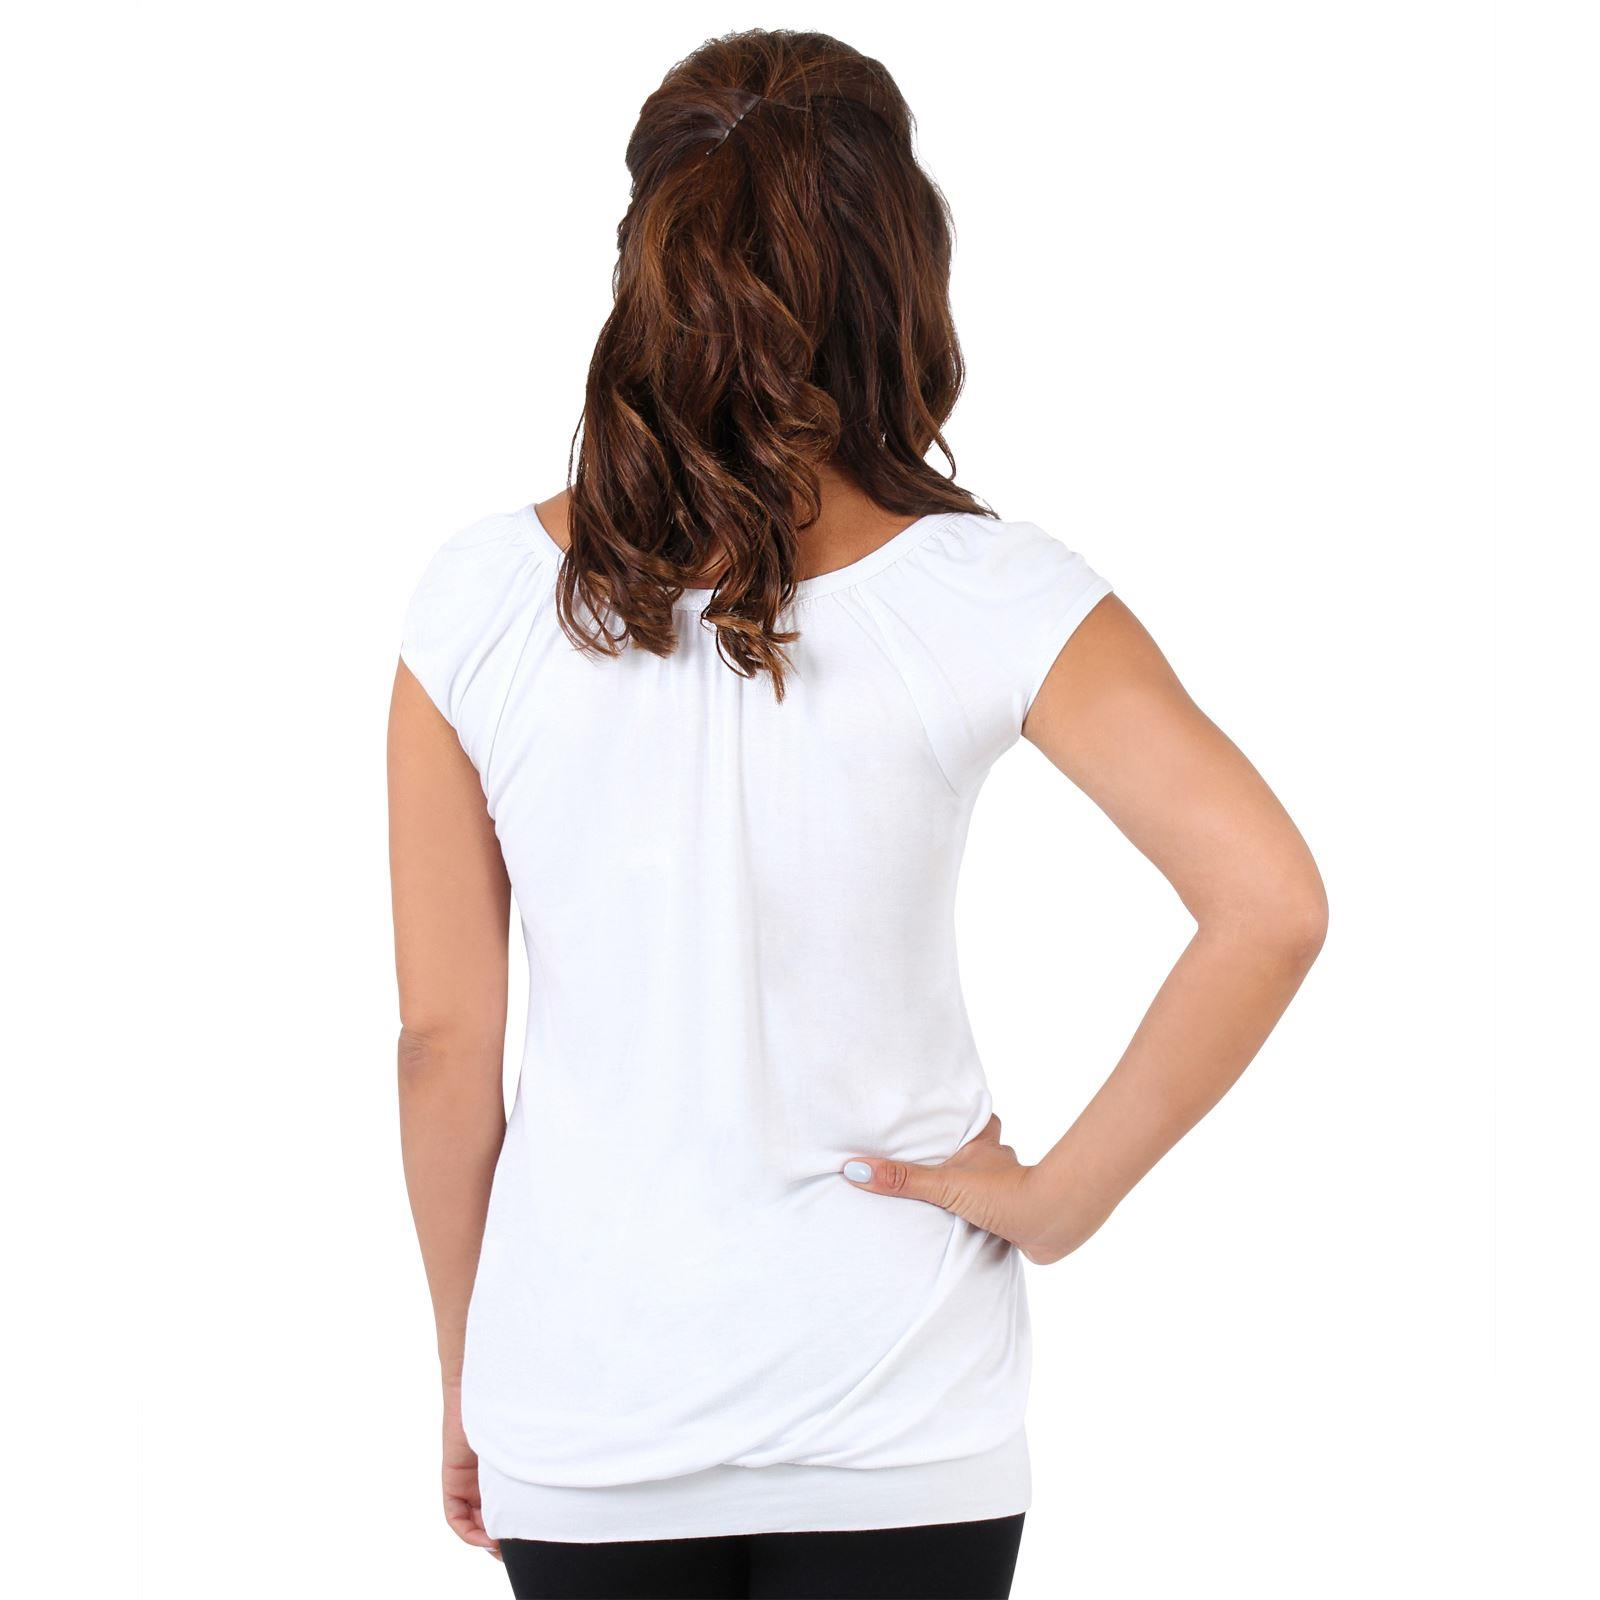 Womens-Ladies-Scoop-Neck-Blouse-V-T-Shirt-Long-Short-Sleeve-Plain-Loose-Top thumbnail 55